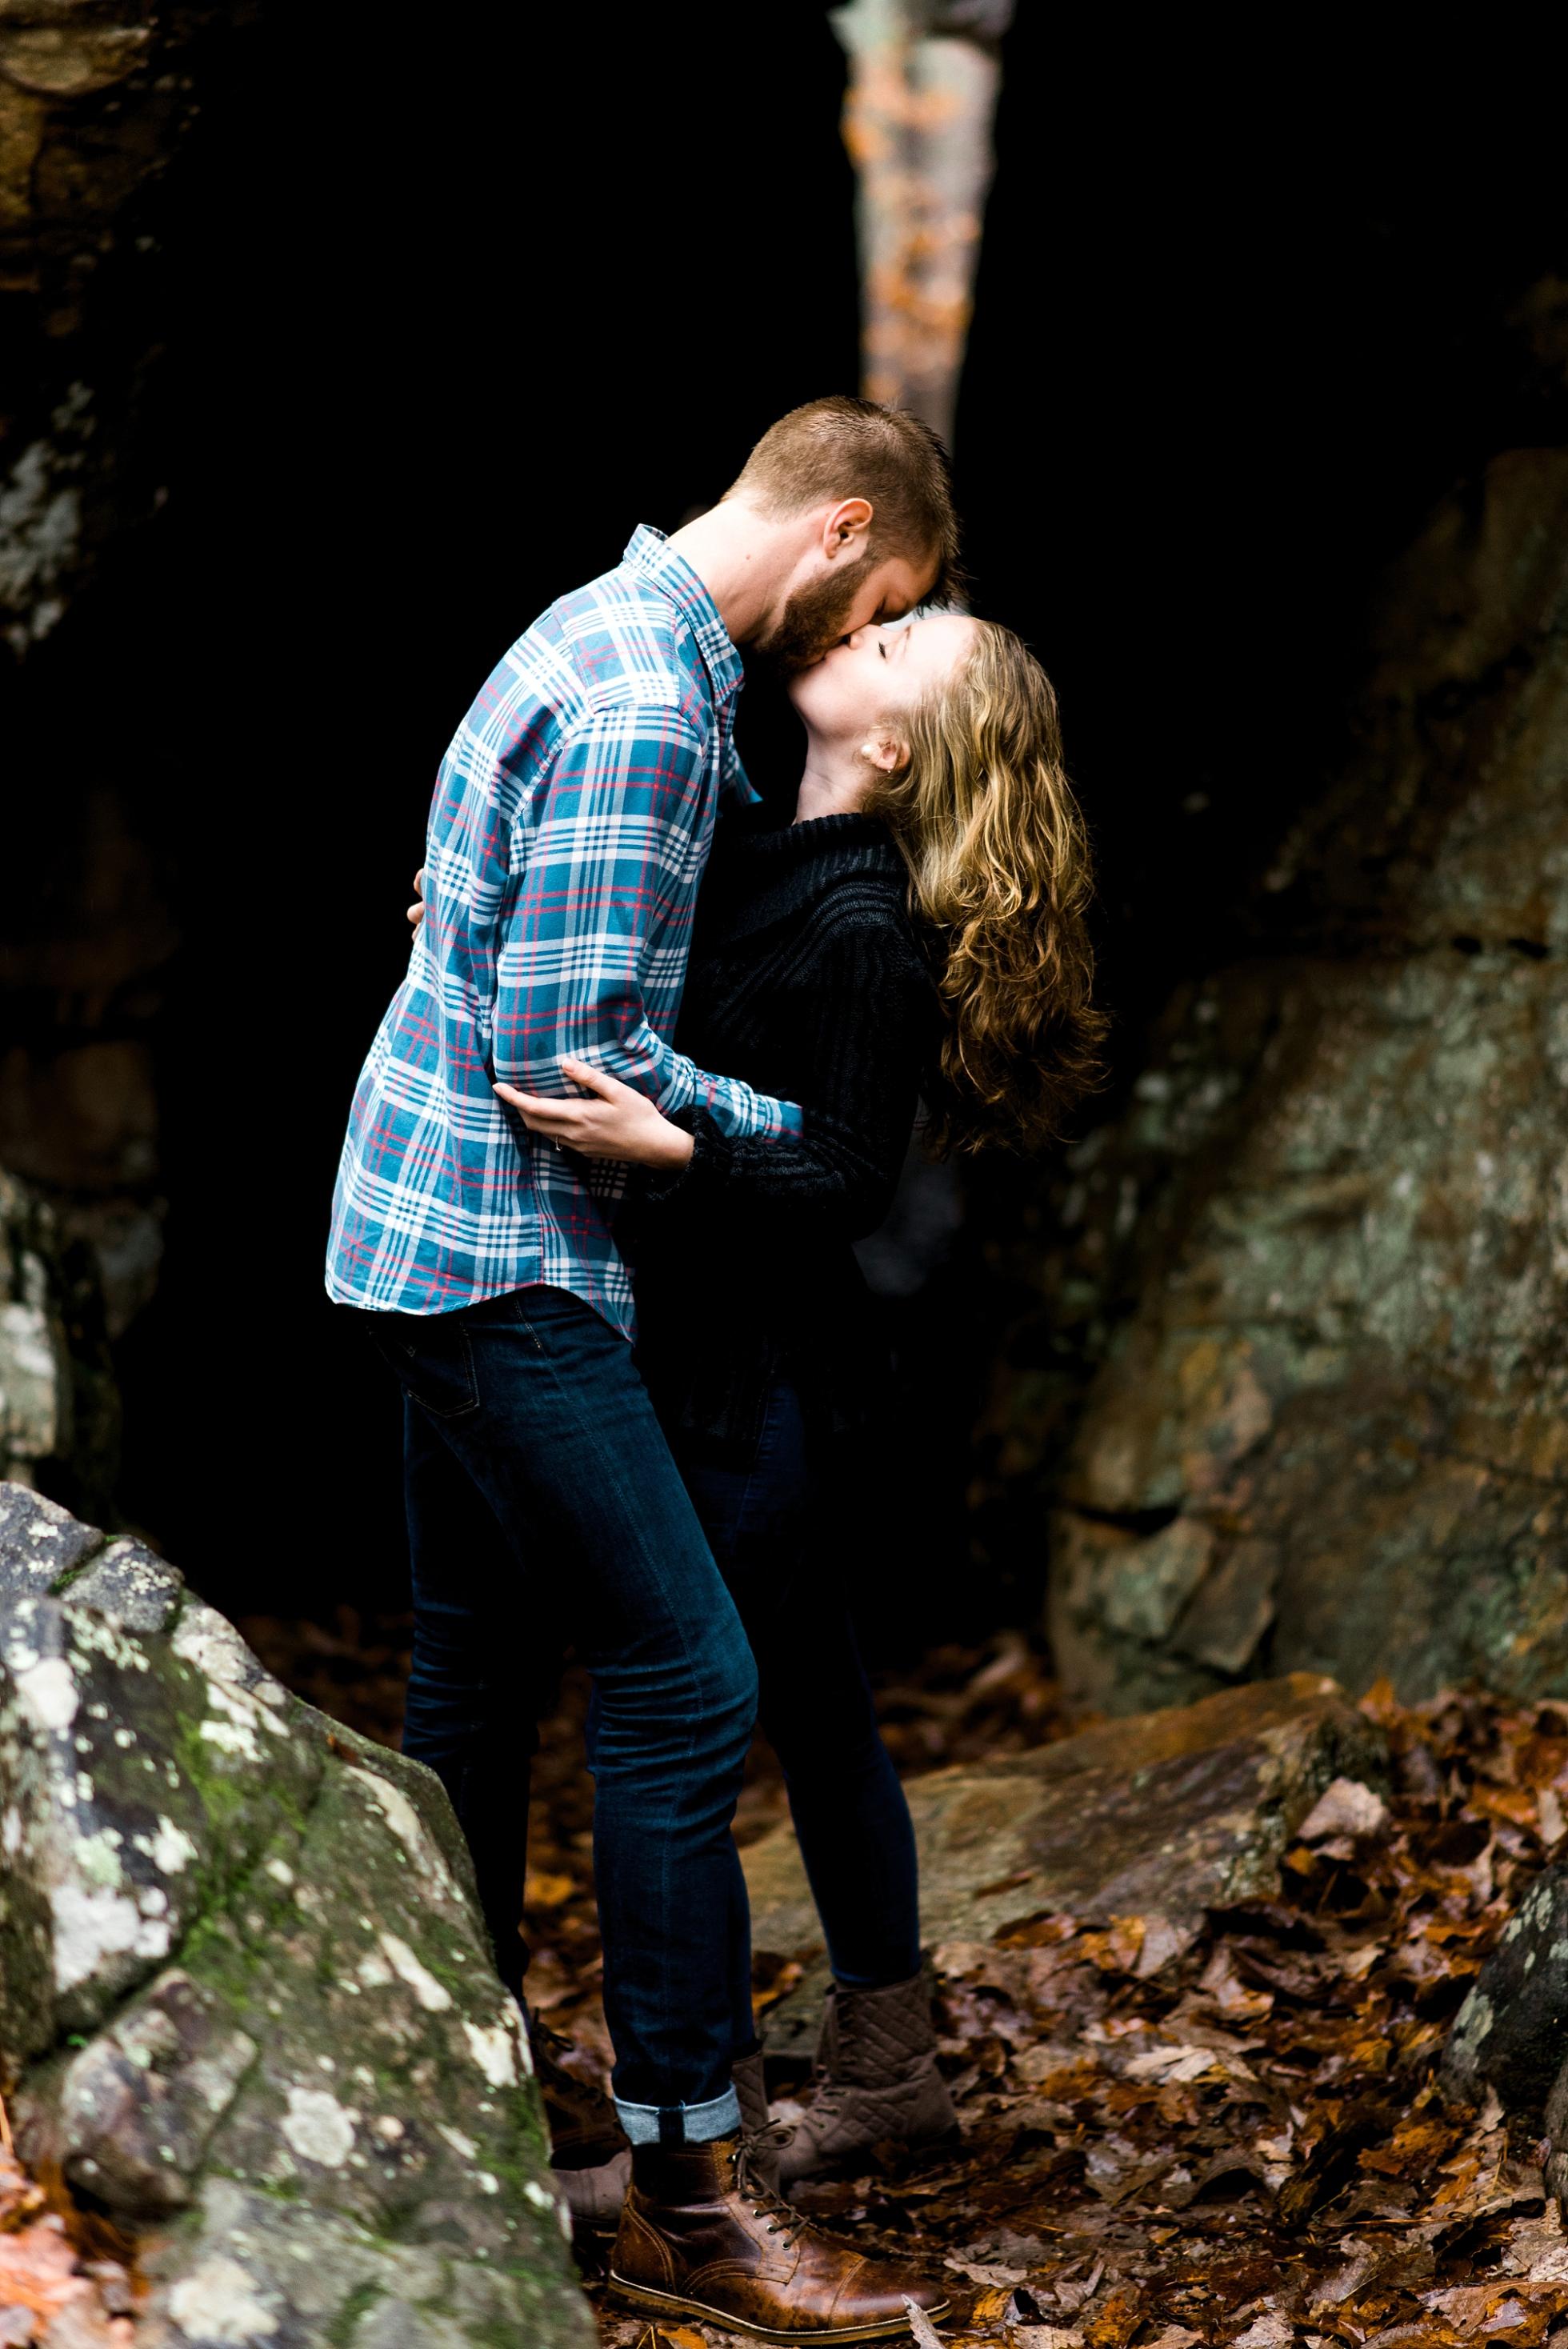 Sam & Sarah   A Moss Rock Preserve Engagement